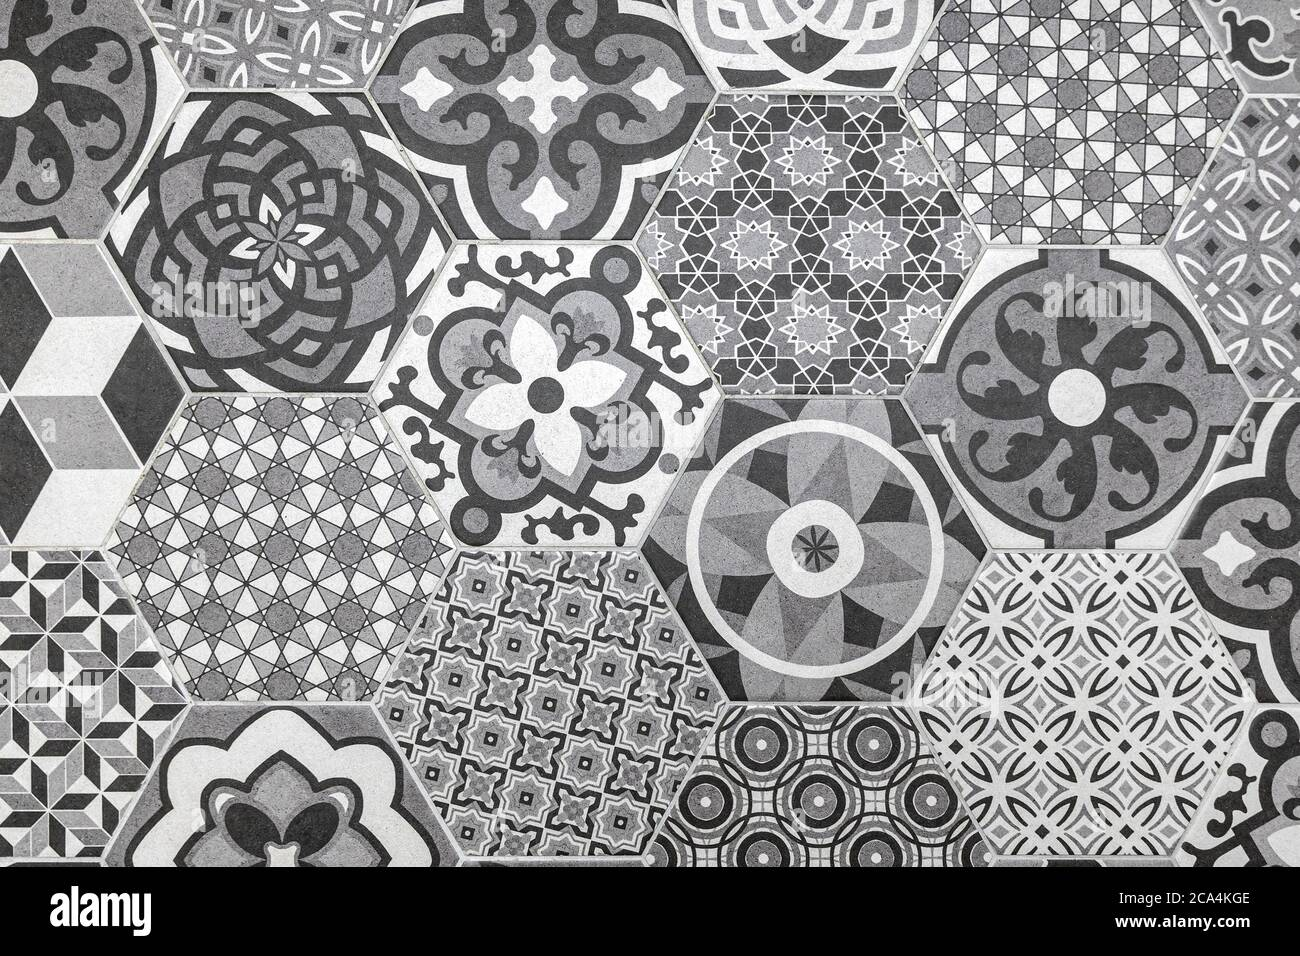 https www alamy com floral vintage hexagon tile pattern image367667454 html